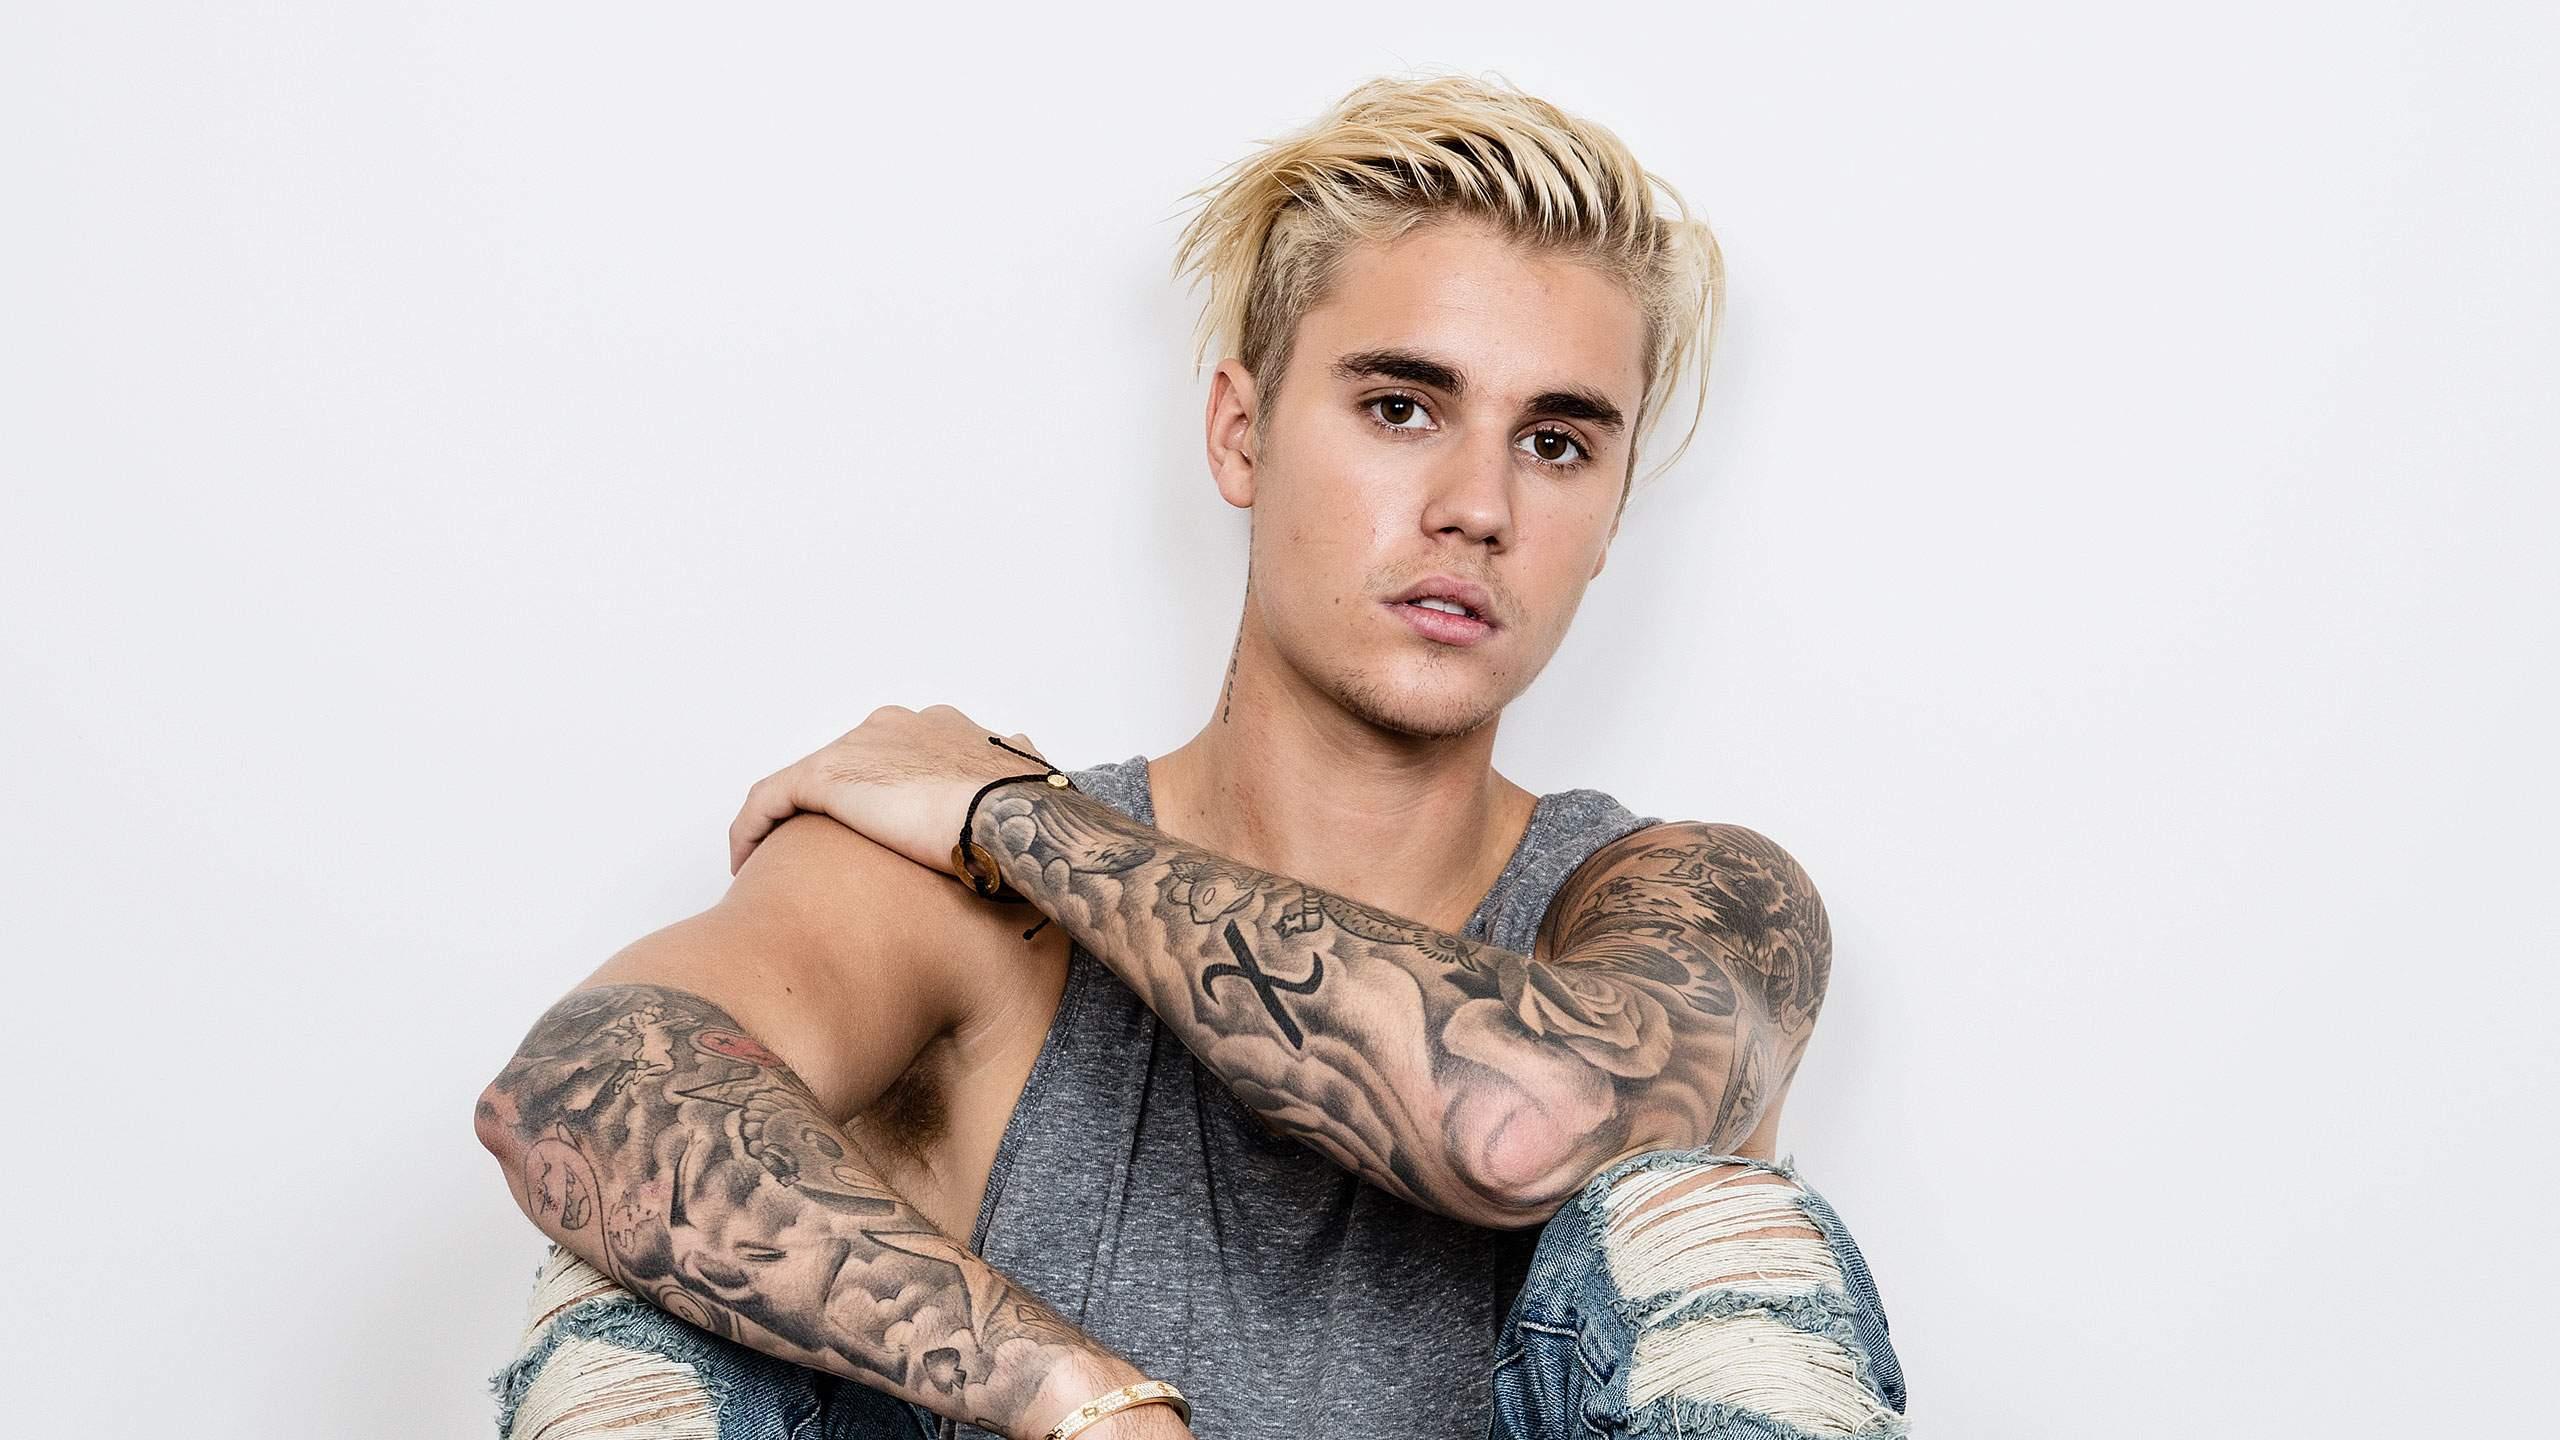 Justin Bieber HD Deskto